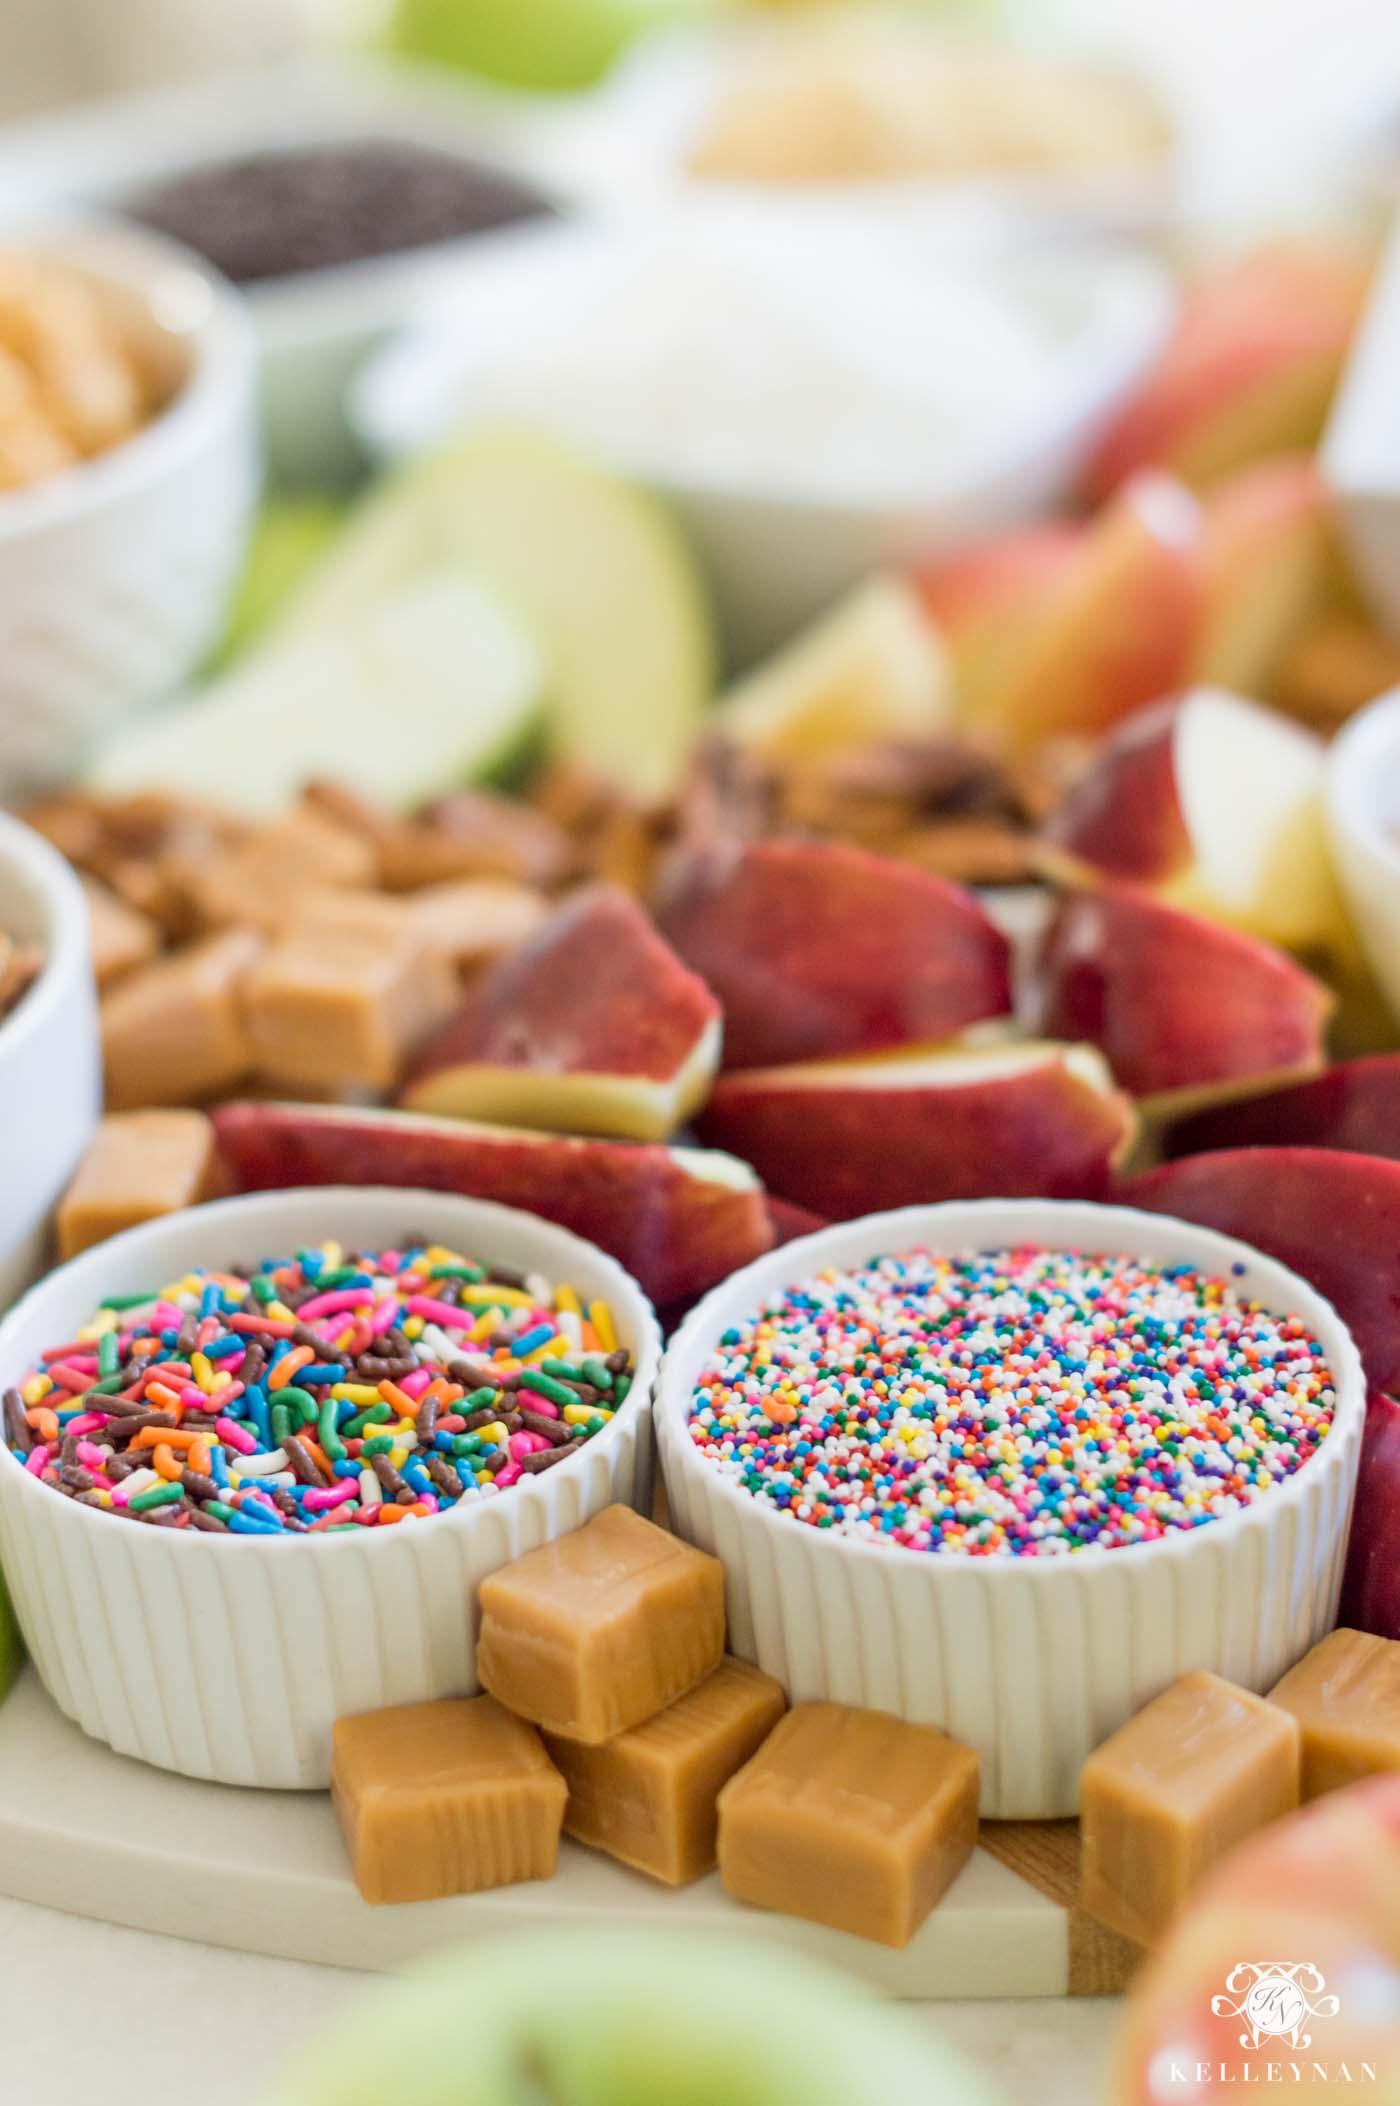 Topping ideas for caramel apples- plus, a full appetizer setup